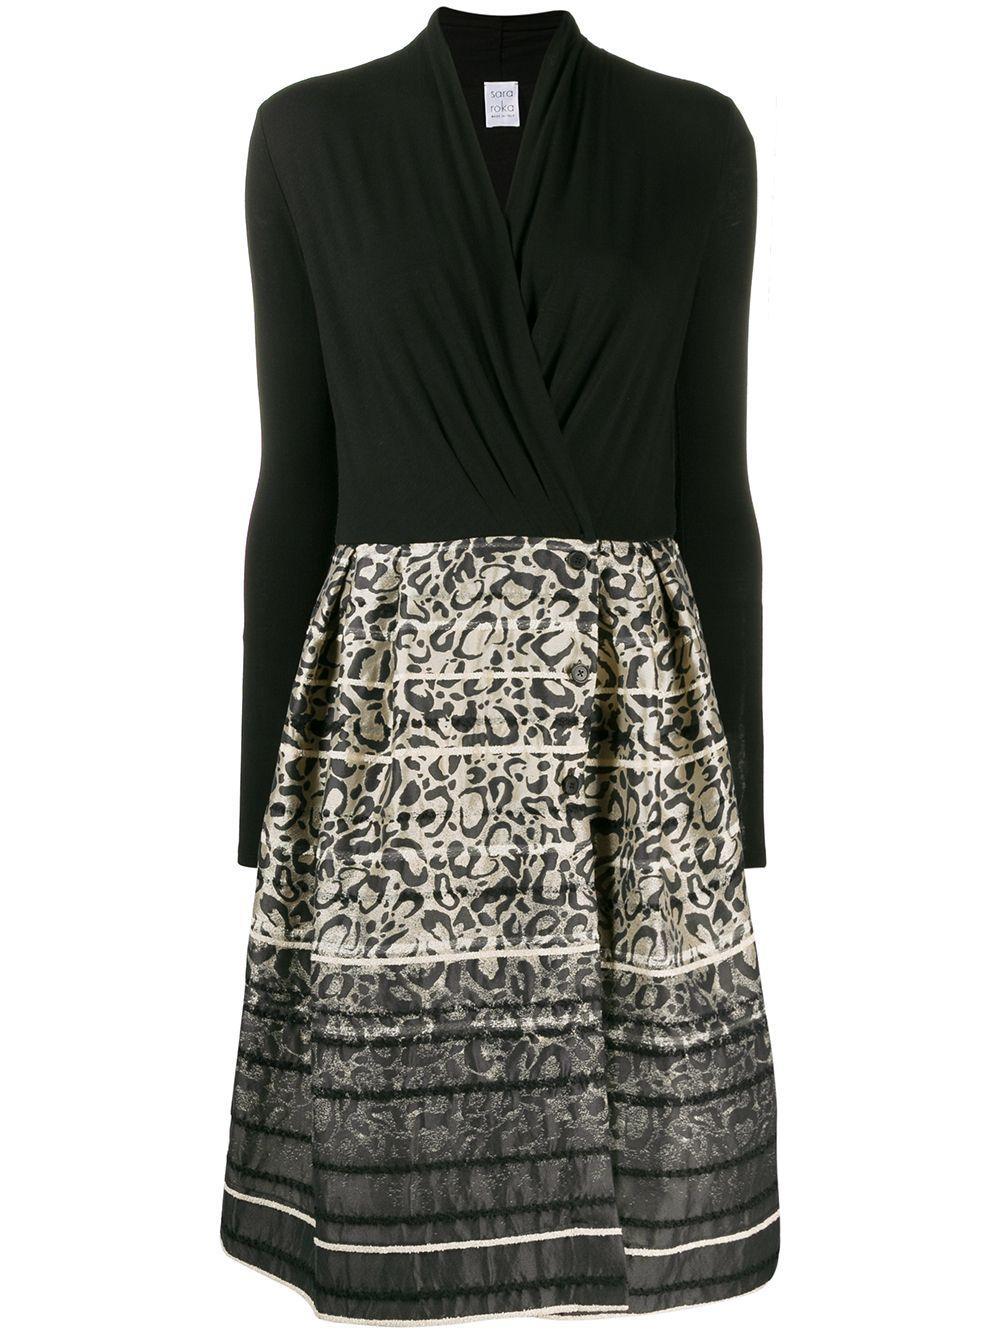 Long Sleeve Wrap Top Dress With Animal Printed Skirt Item # GAIL57-24